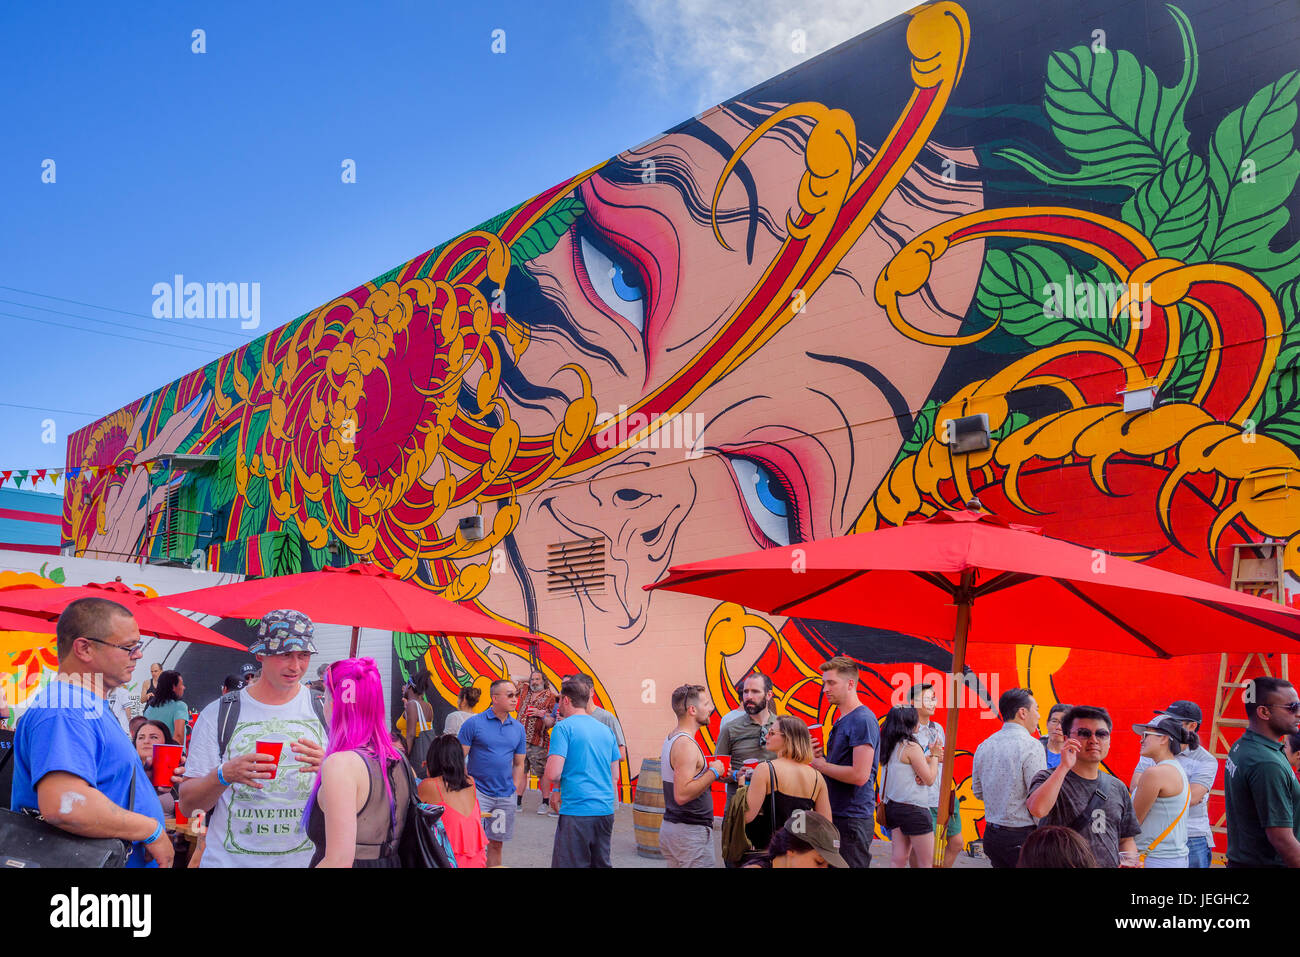 Vancouver, Canadá. 24 Jun, 2017. Strathcona fiesta en la Calle, Festival de murales de Vancouver, Vancouver, Imagen De Stock